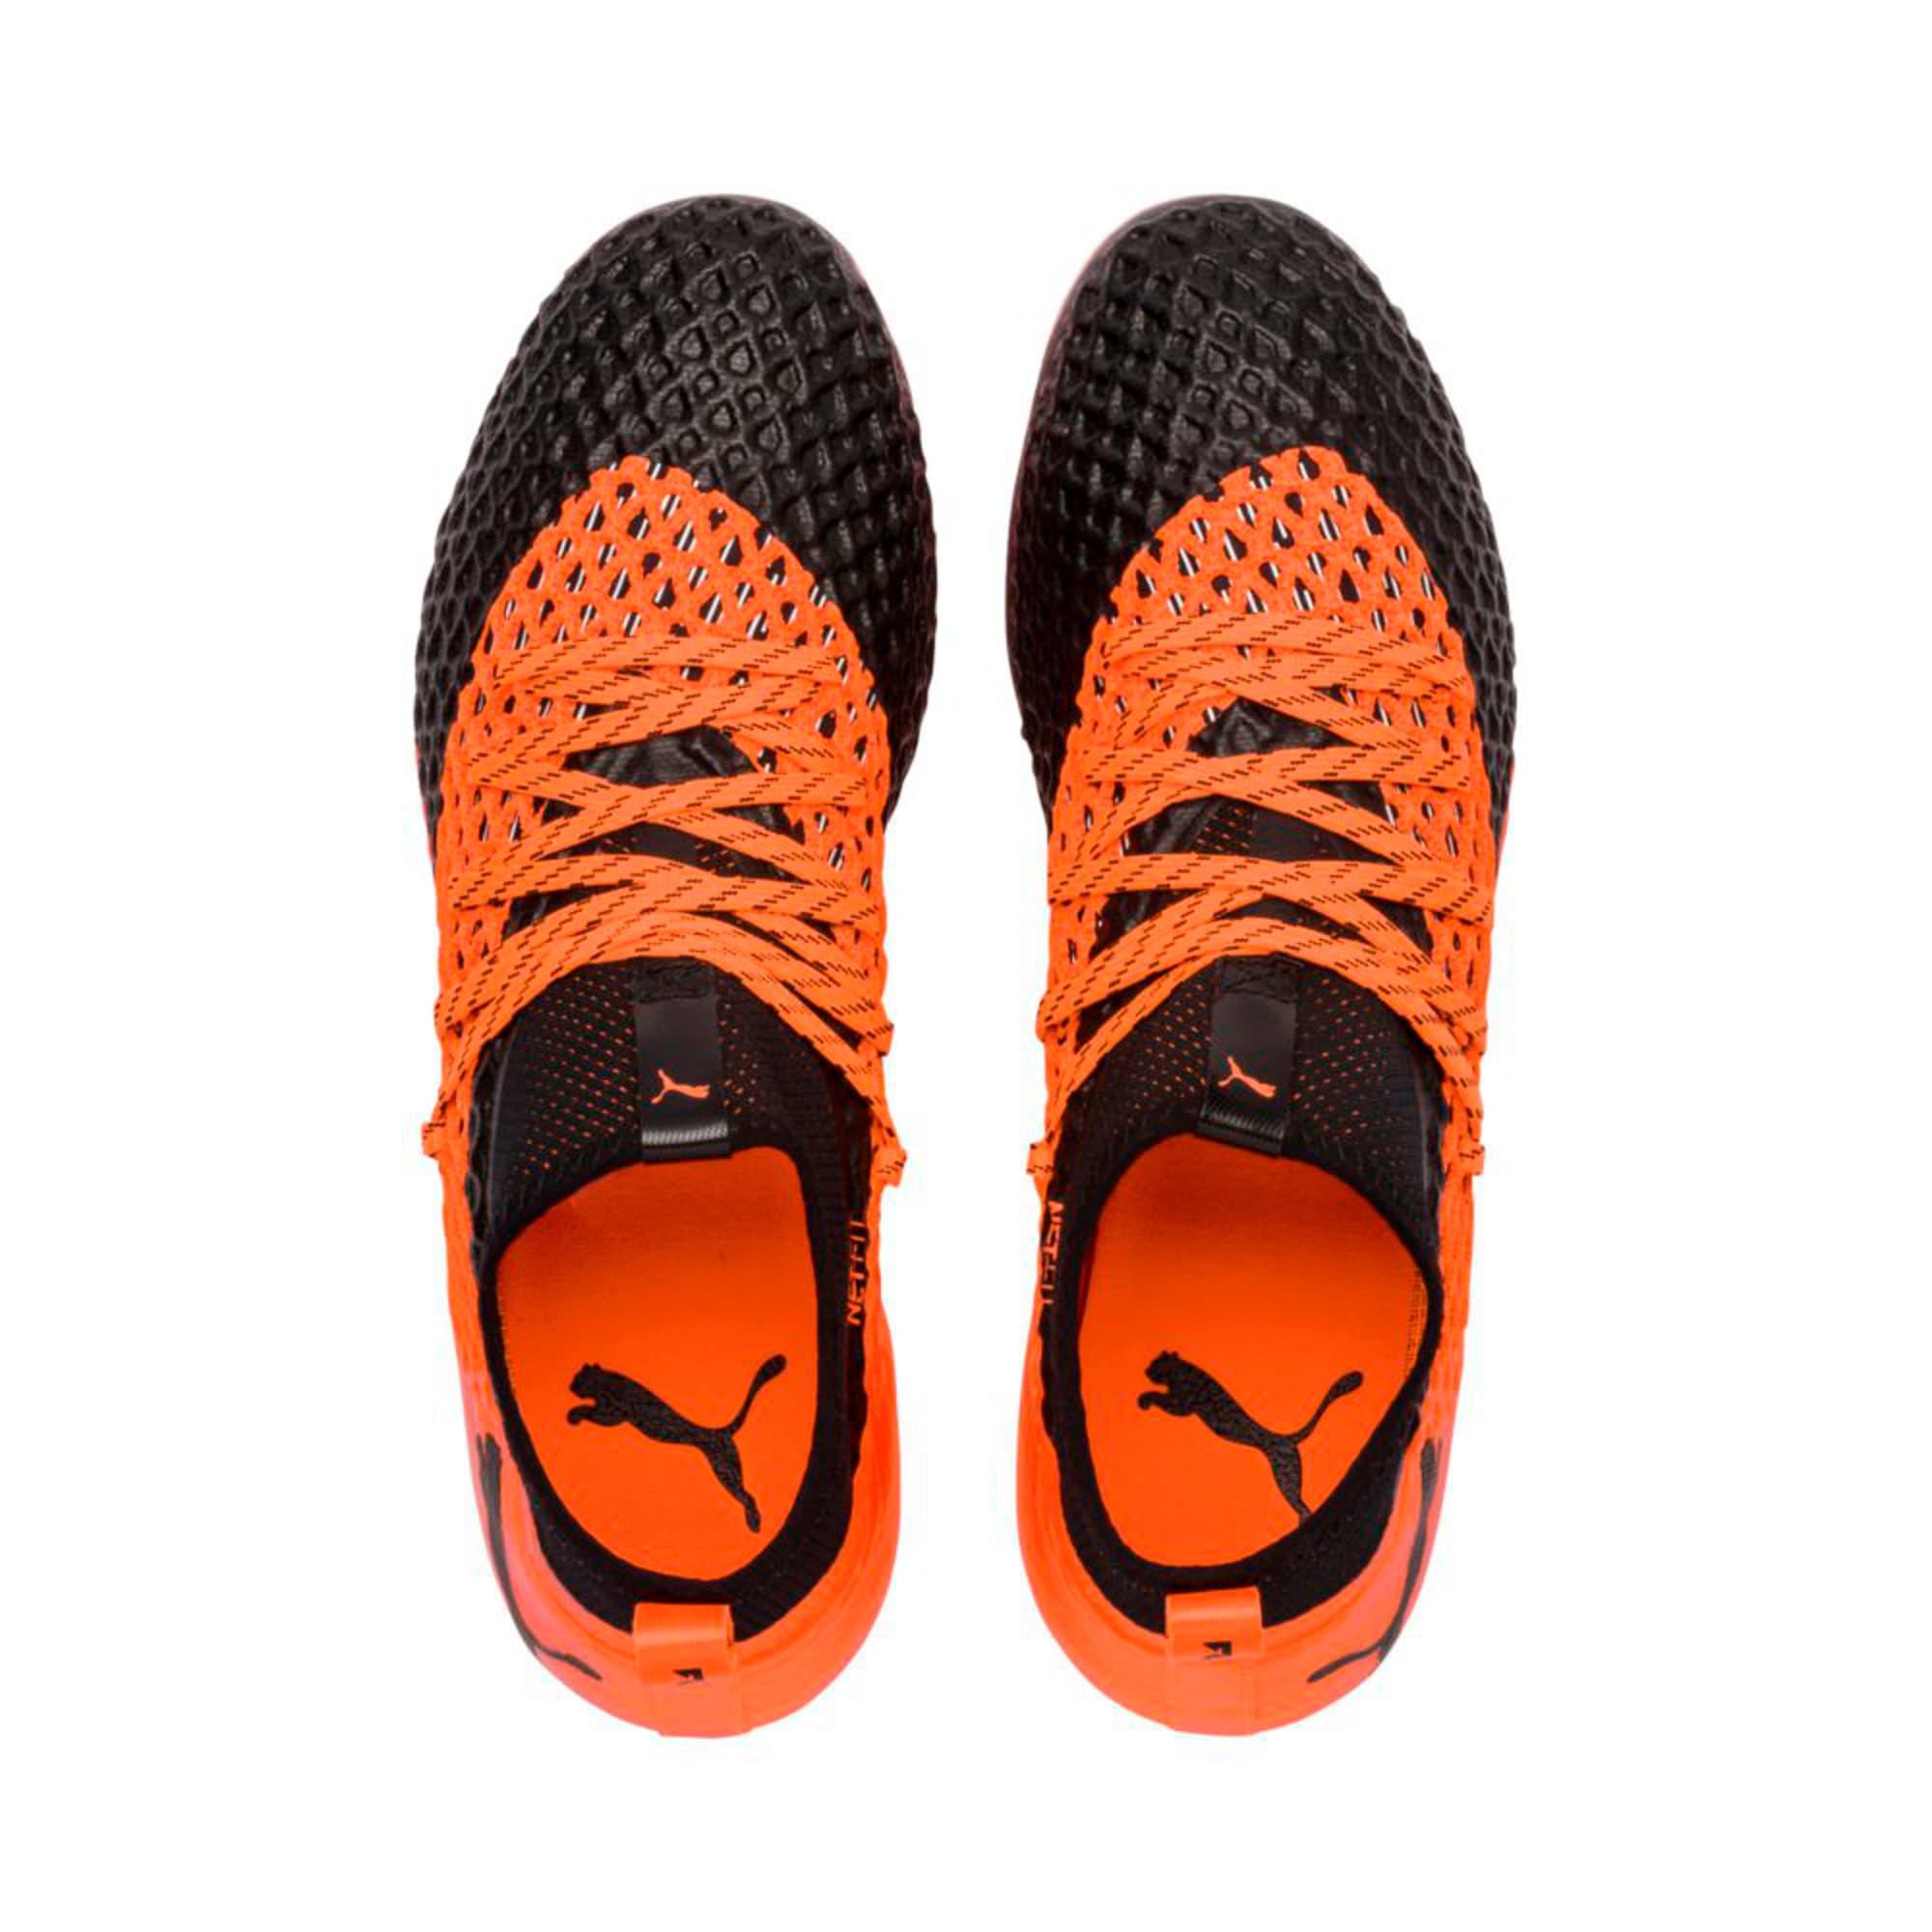 Thumbnail 3 of FUTURE 2.2 NETFIT FG/AG  Football Boots, Black-Orange, medium-IND